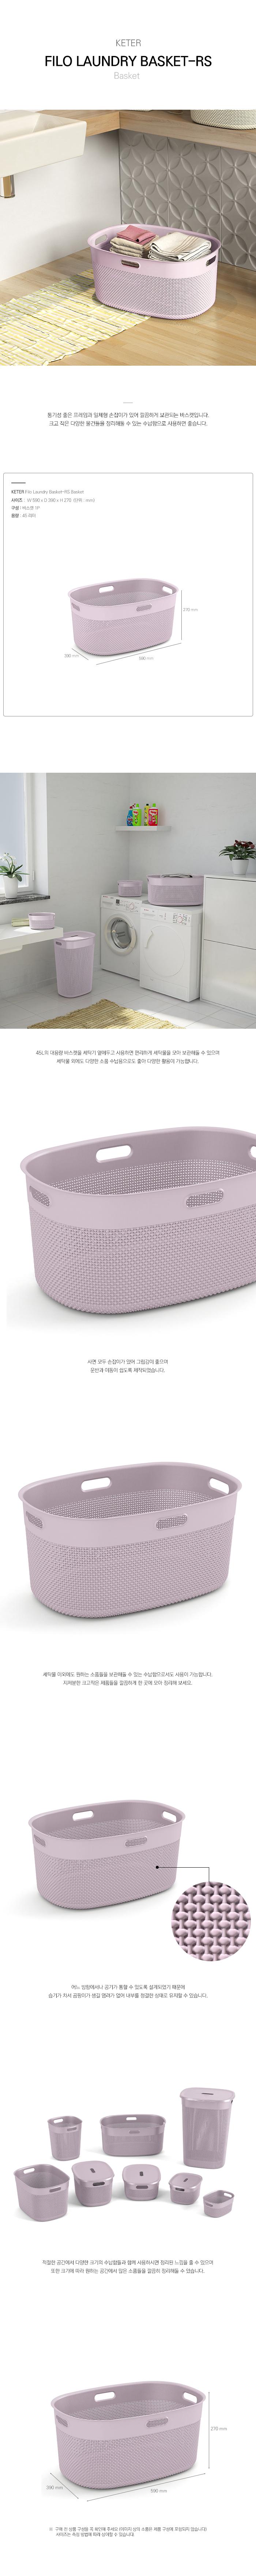 Filo-Laundry-Basket-RS.jpg